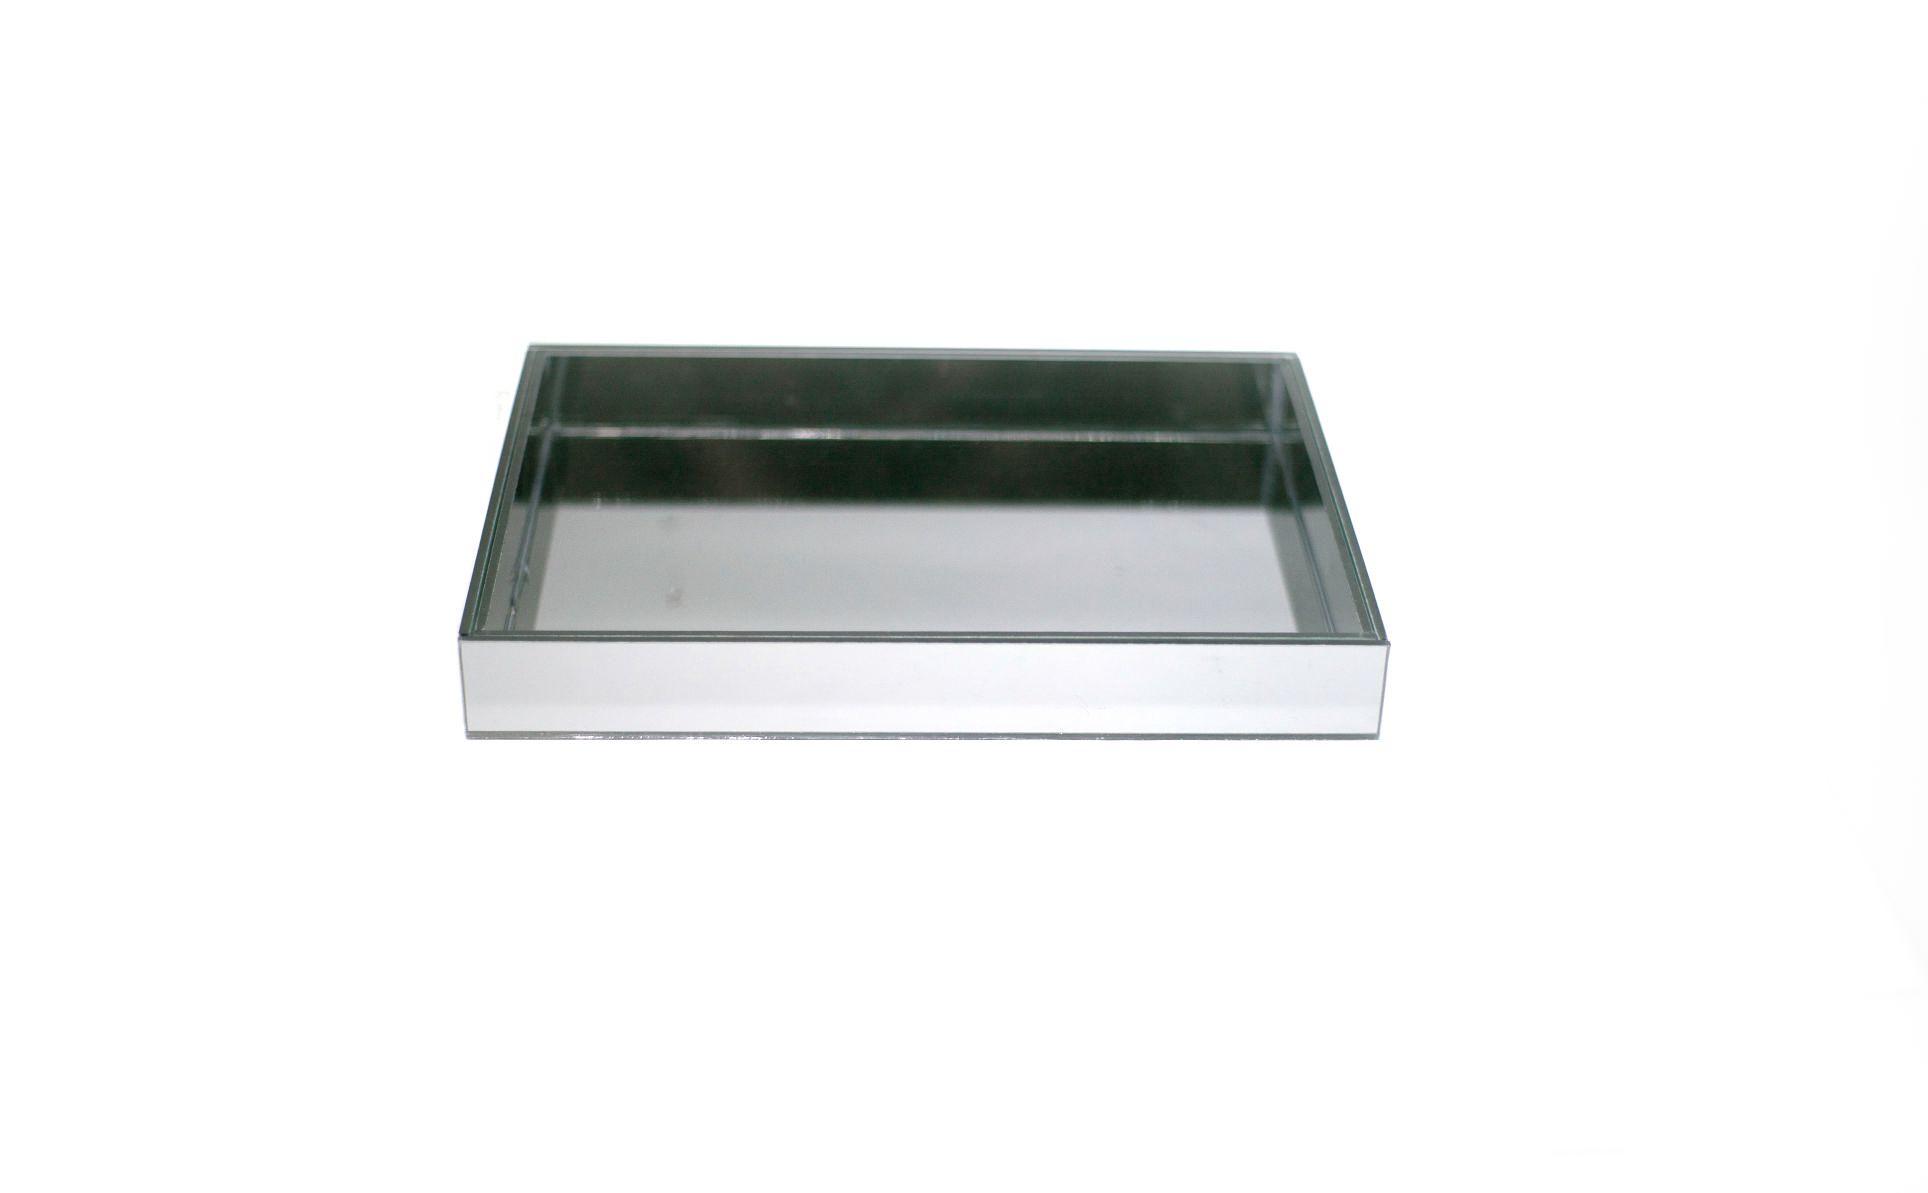 Bandeja Espelhada Fume De Mesa Para Sala Jantar 30x20